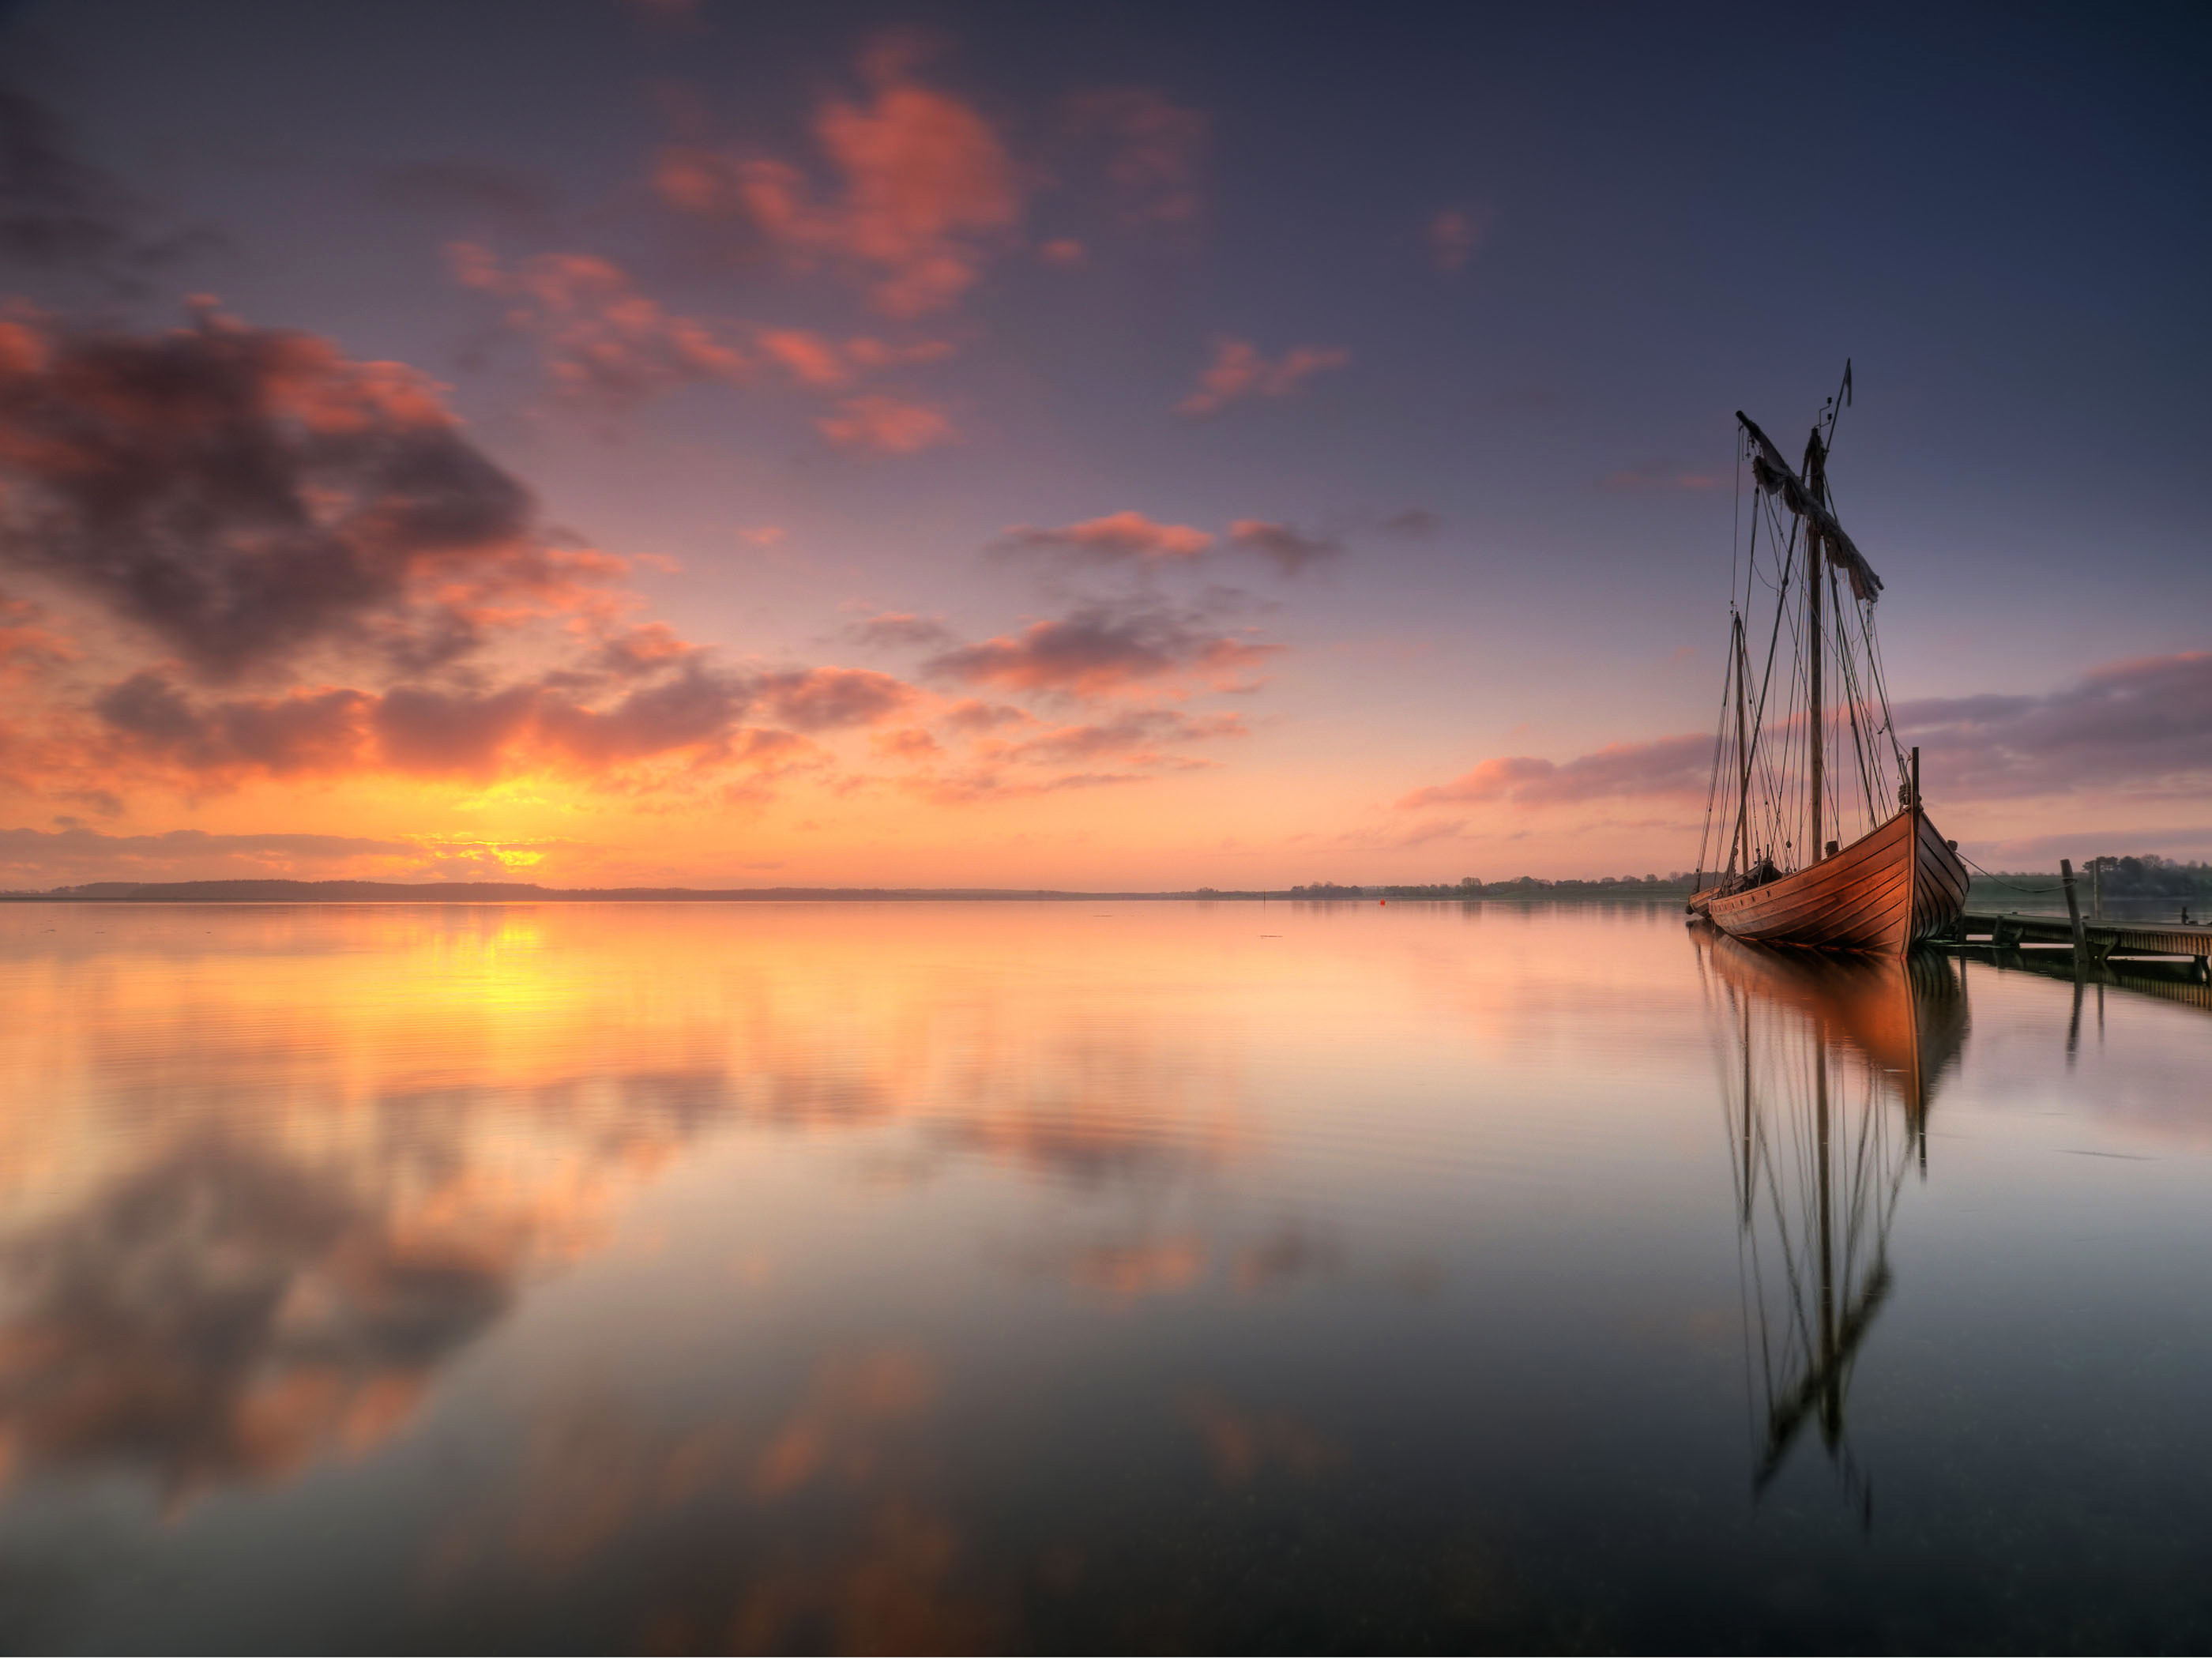 Ipad Wallpaper Beach Scenes: The Wallpaper Of Beautiful Viking Ship In Denmark